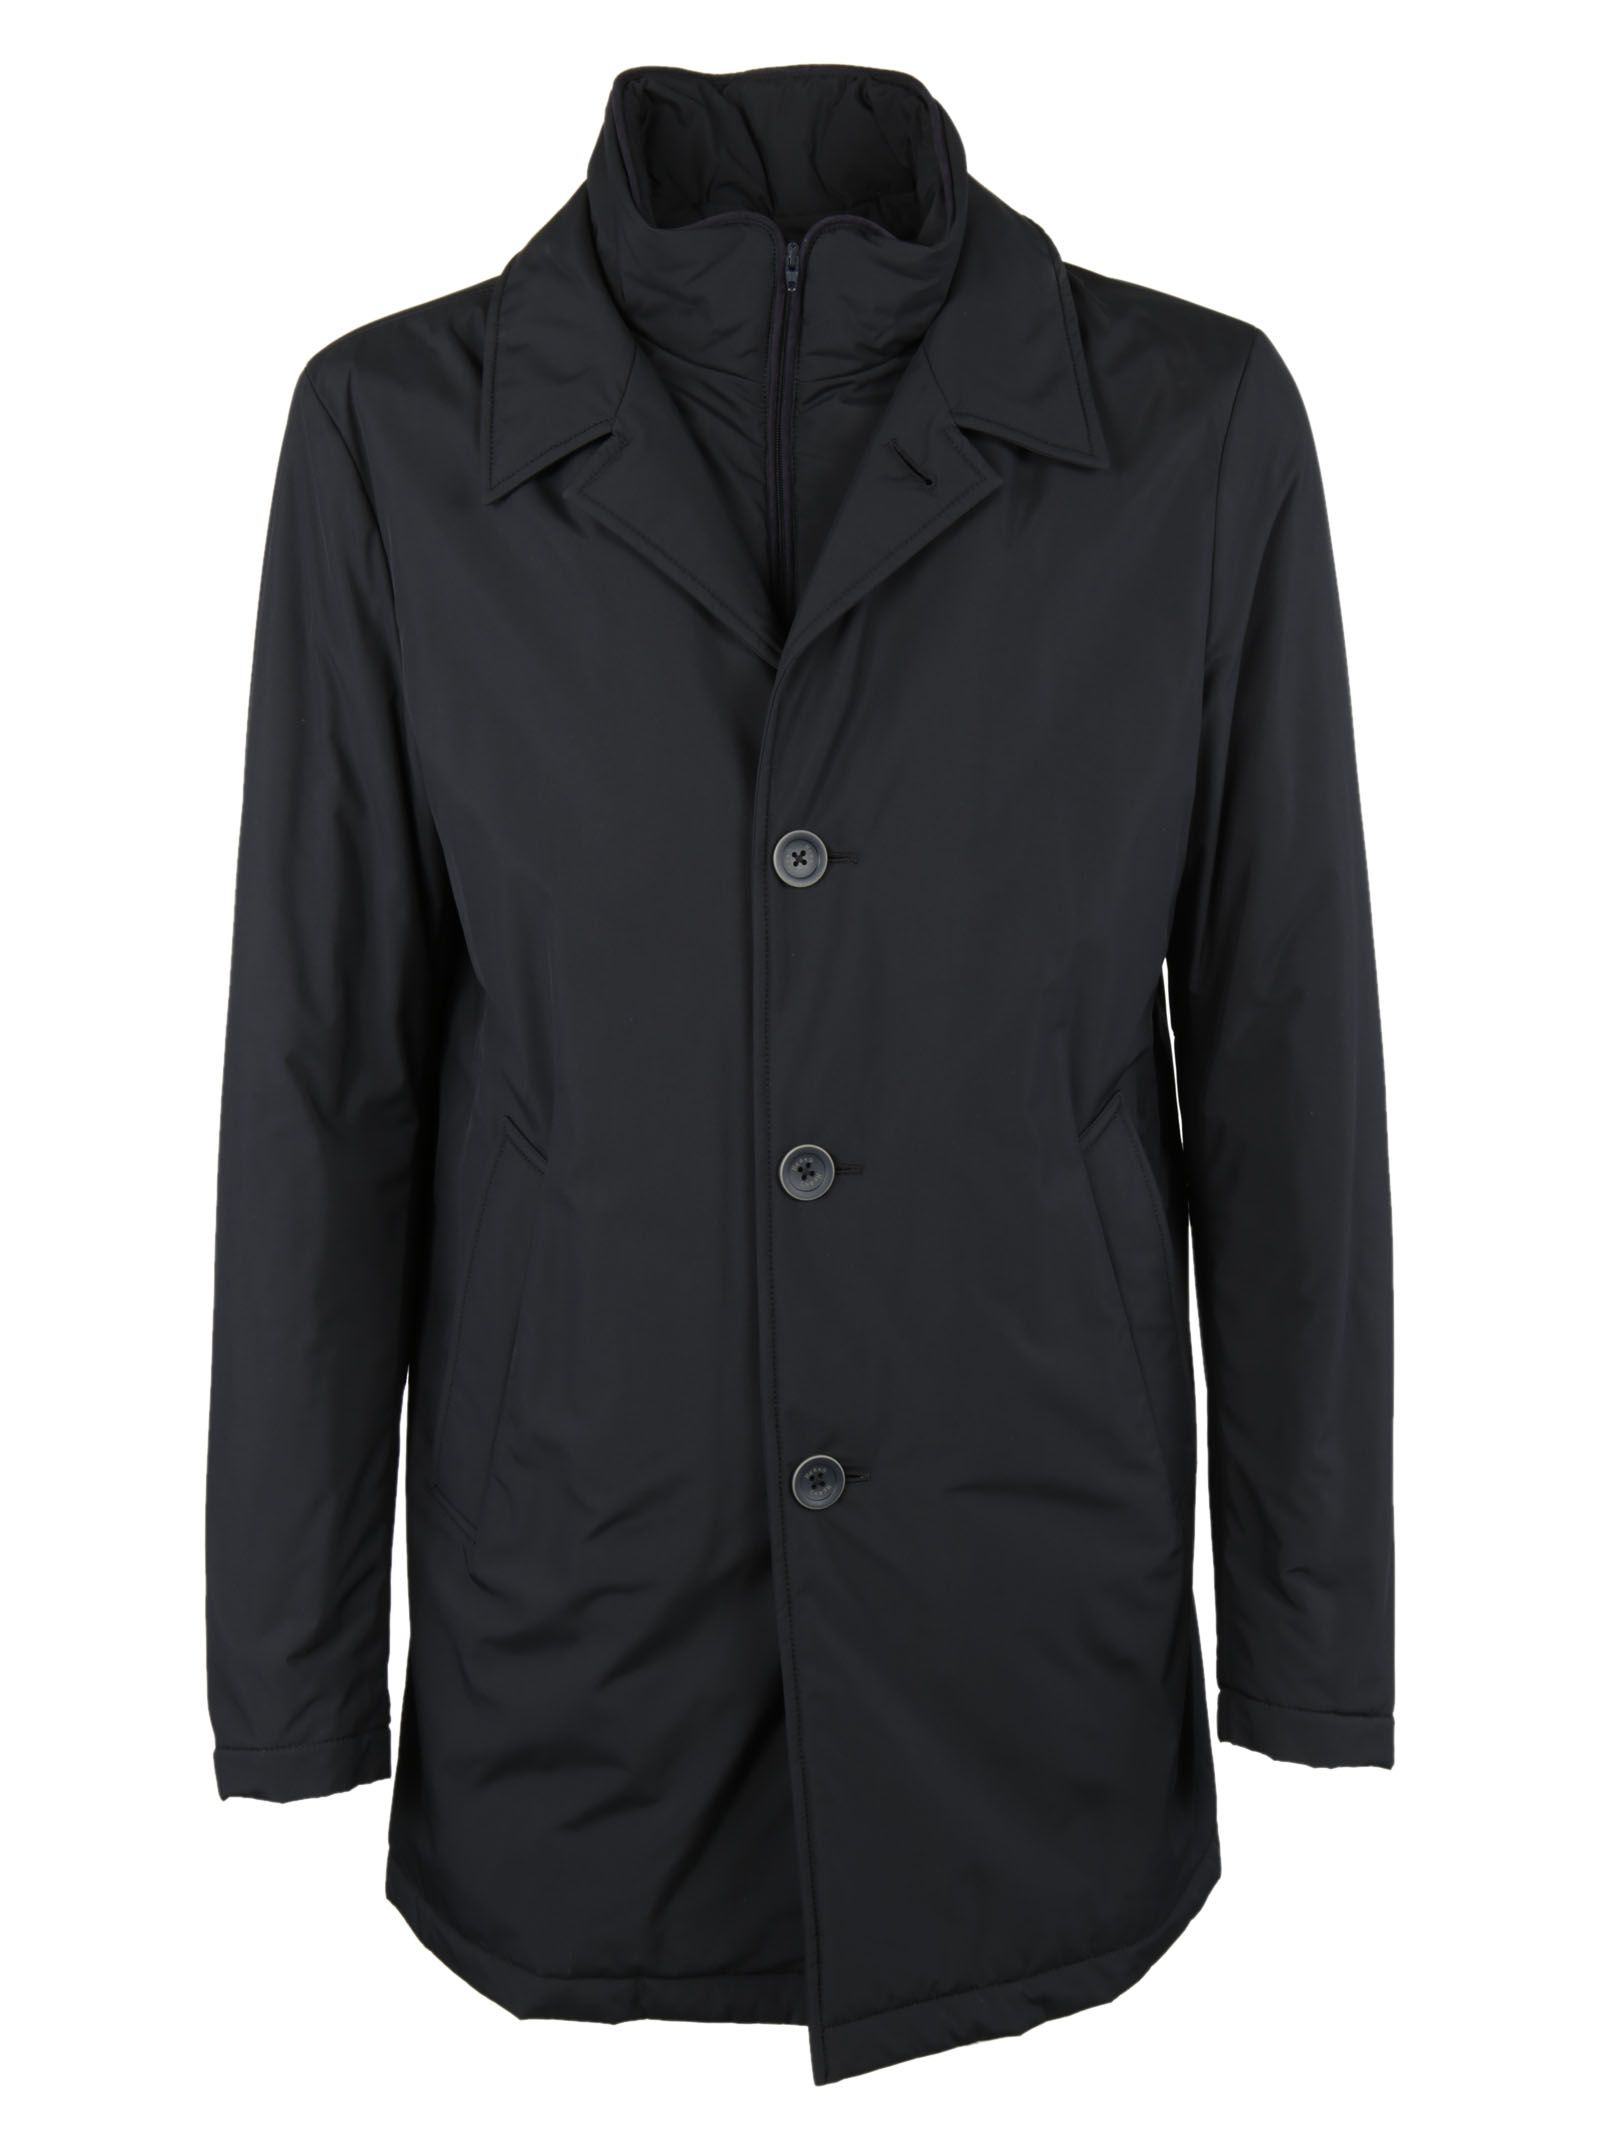 Herno Collared Jacket